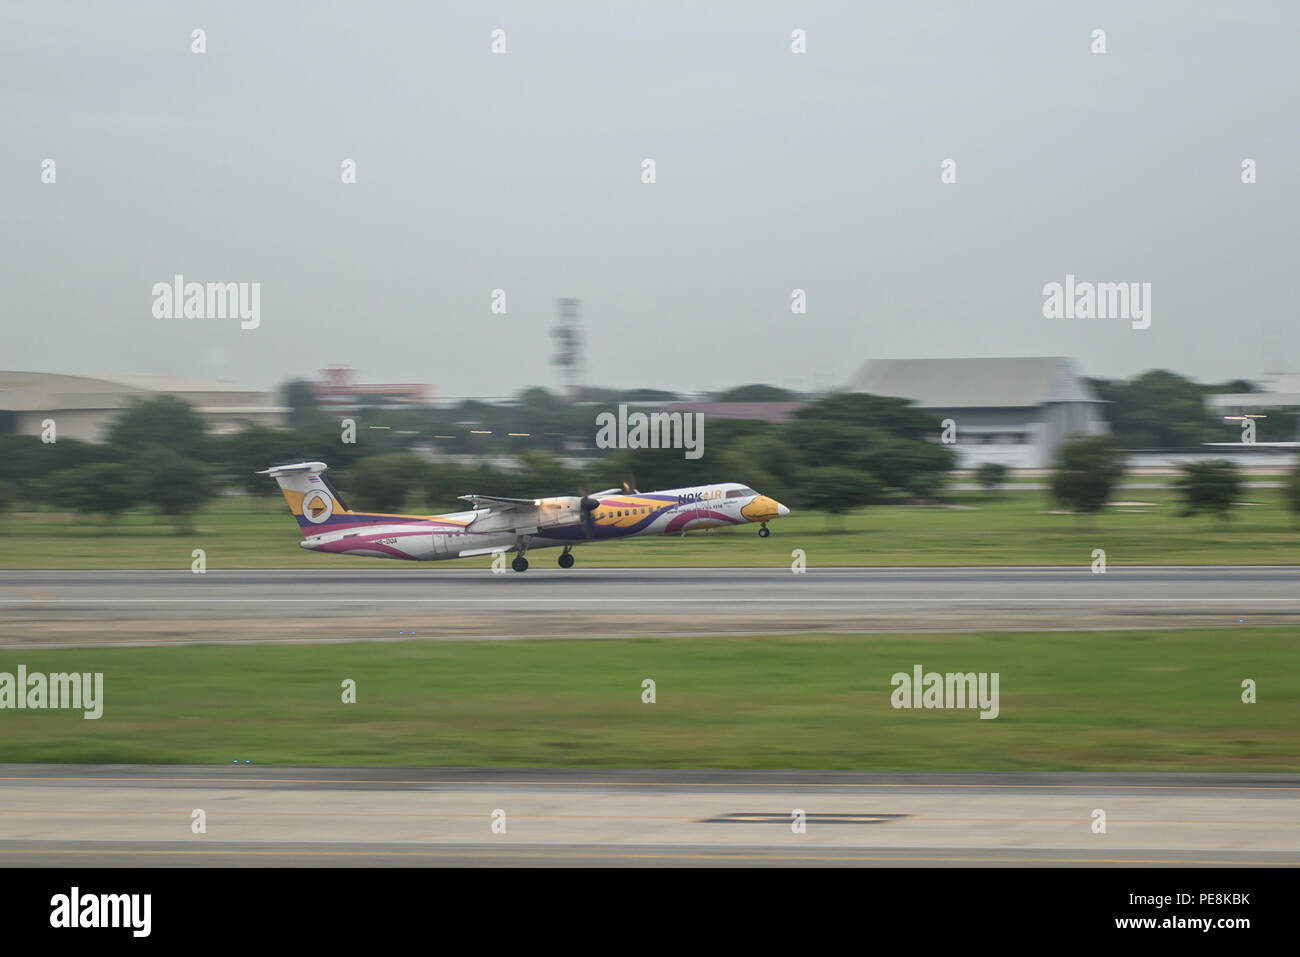 Bangkok, Thailand, 13th Aug 2018: Nok Air Reg. no. HS-DQA Dash8 Q400 Flight DD9114 taking off from DMK to Roi Et (ROI) - Stock Image